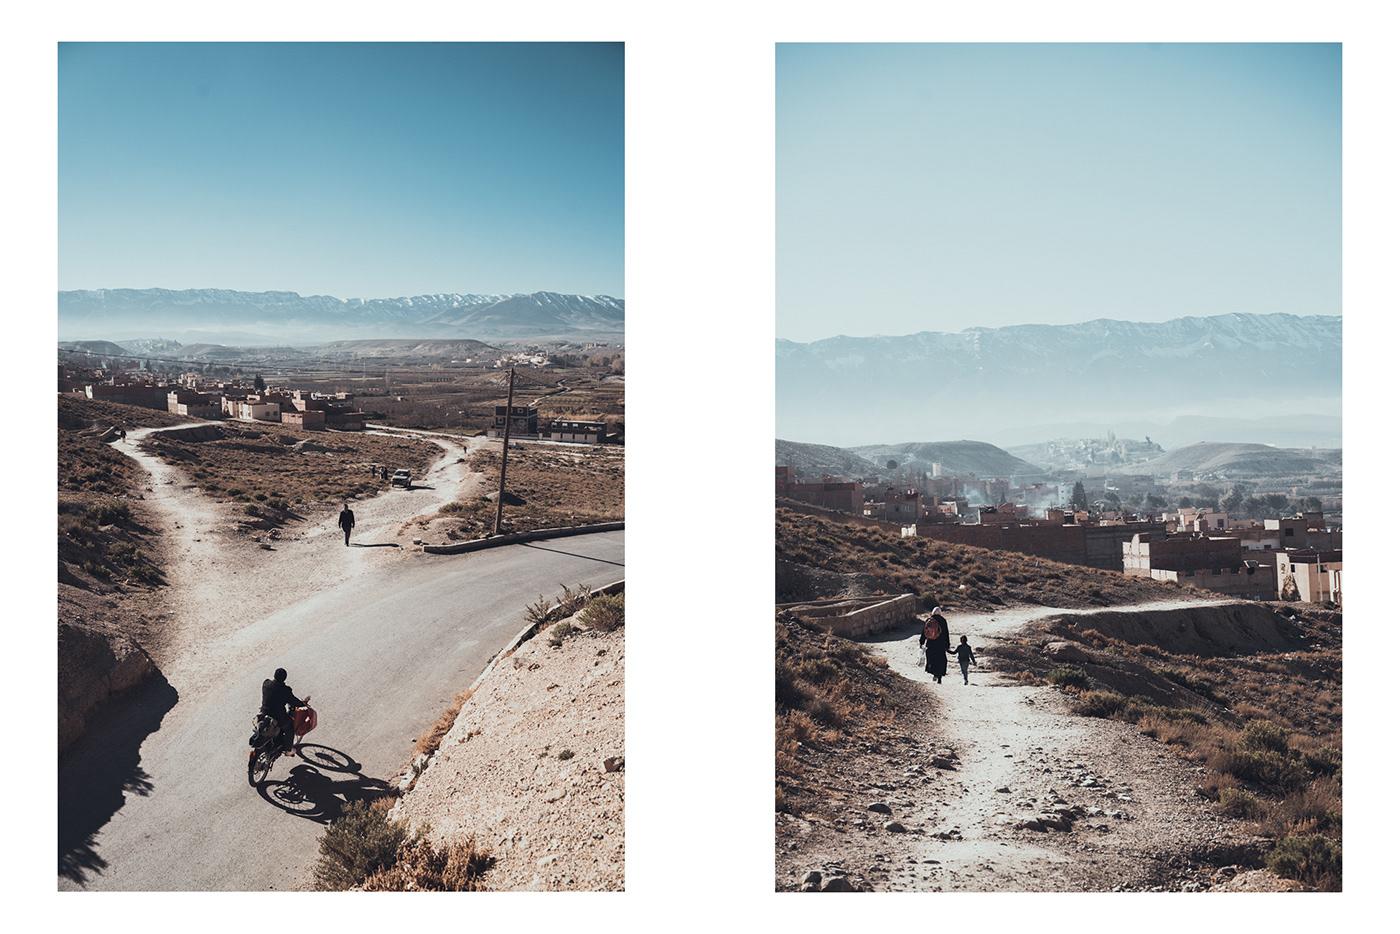 Morocco Marrakech cinematic RoadTrip grading portraits Cinema streetphotography rabat africa